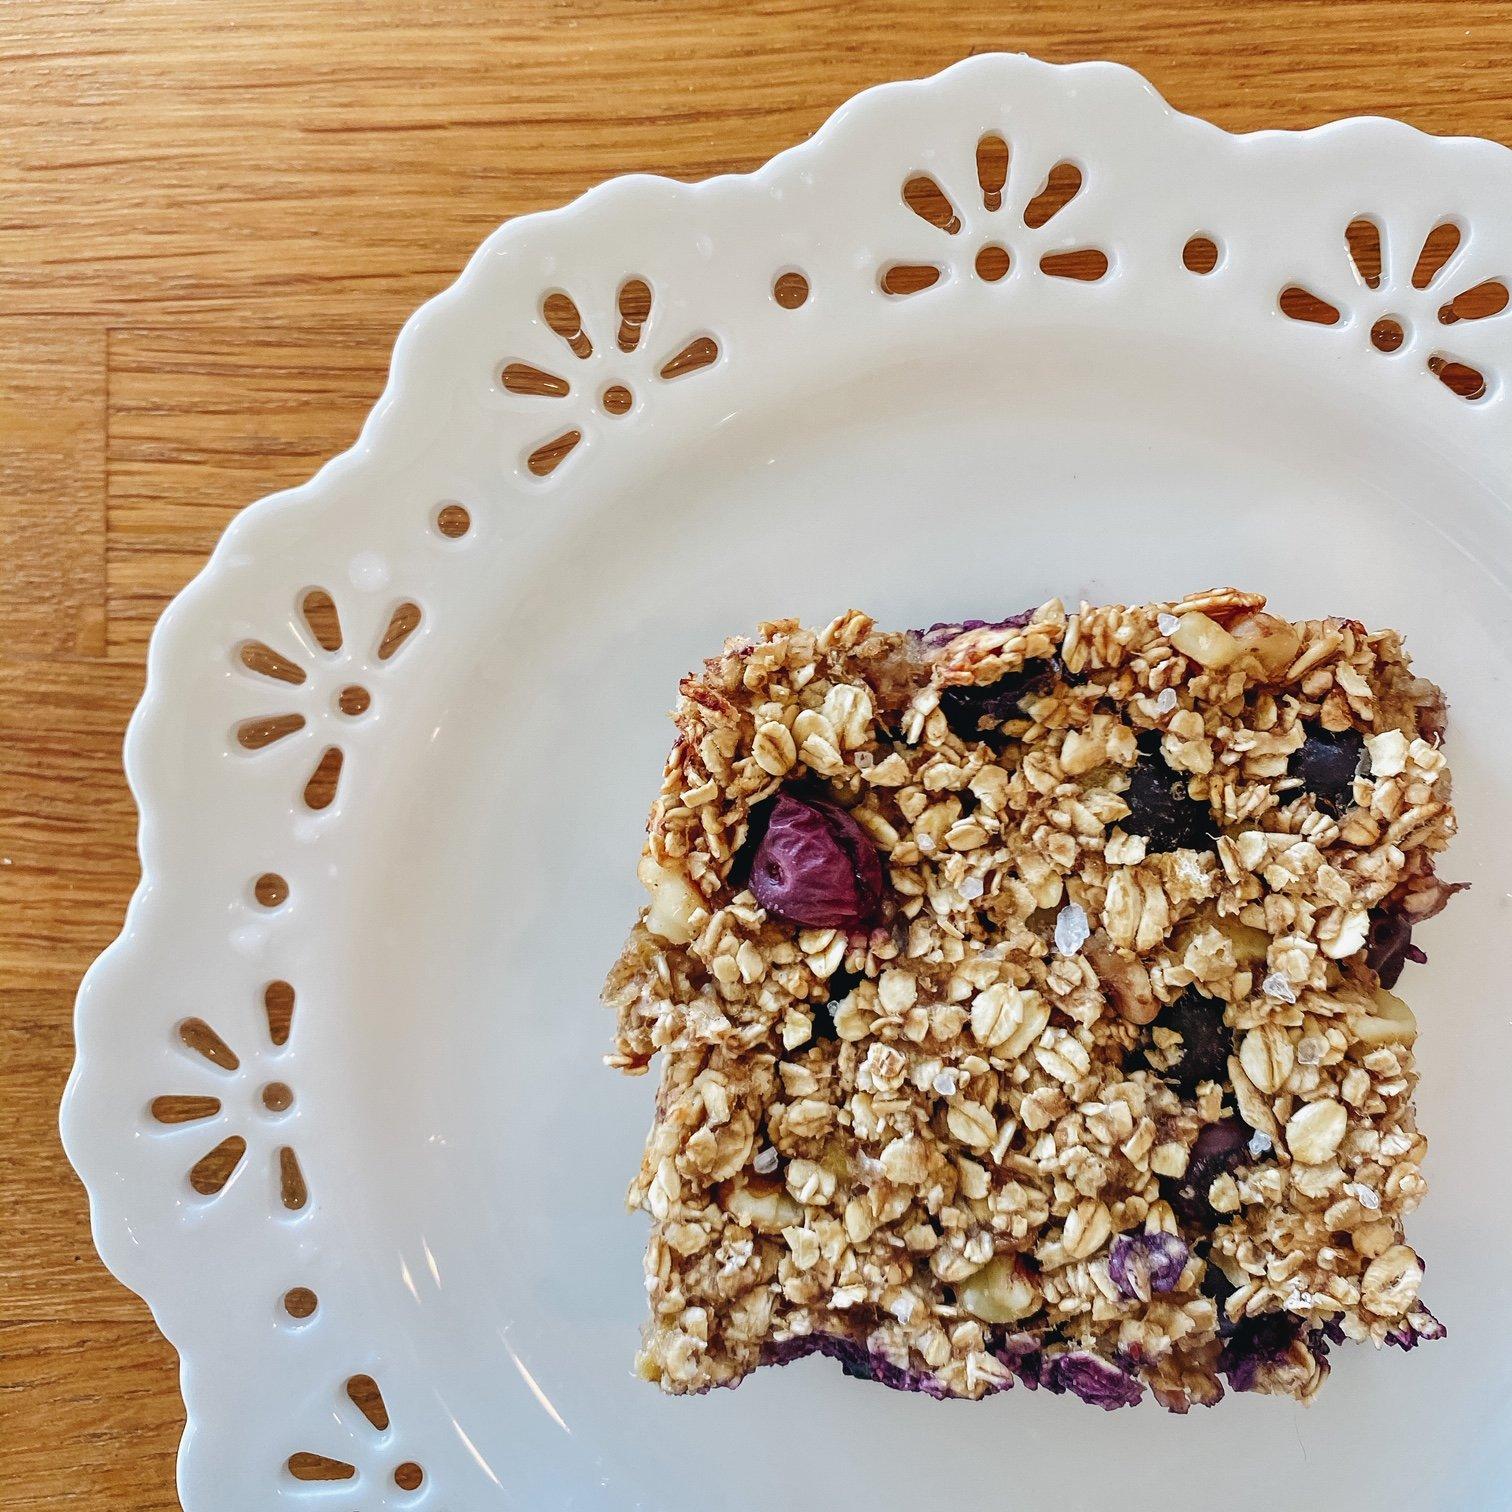 Gluten Free & Vegan Banana Oatmeal Bars w/ Blueberries & Walnuts Recipe